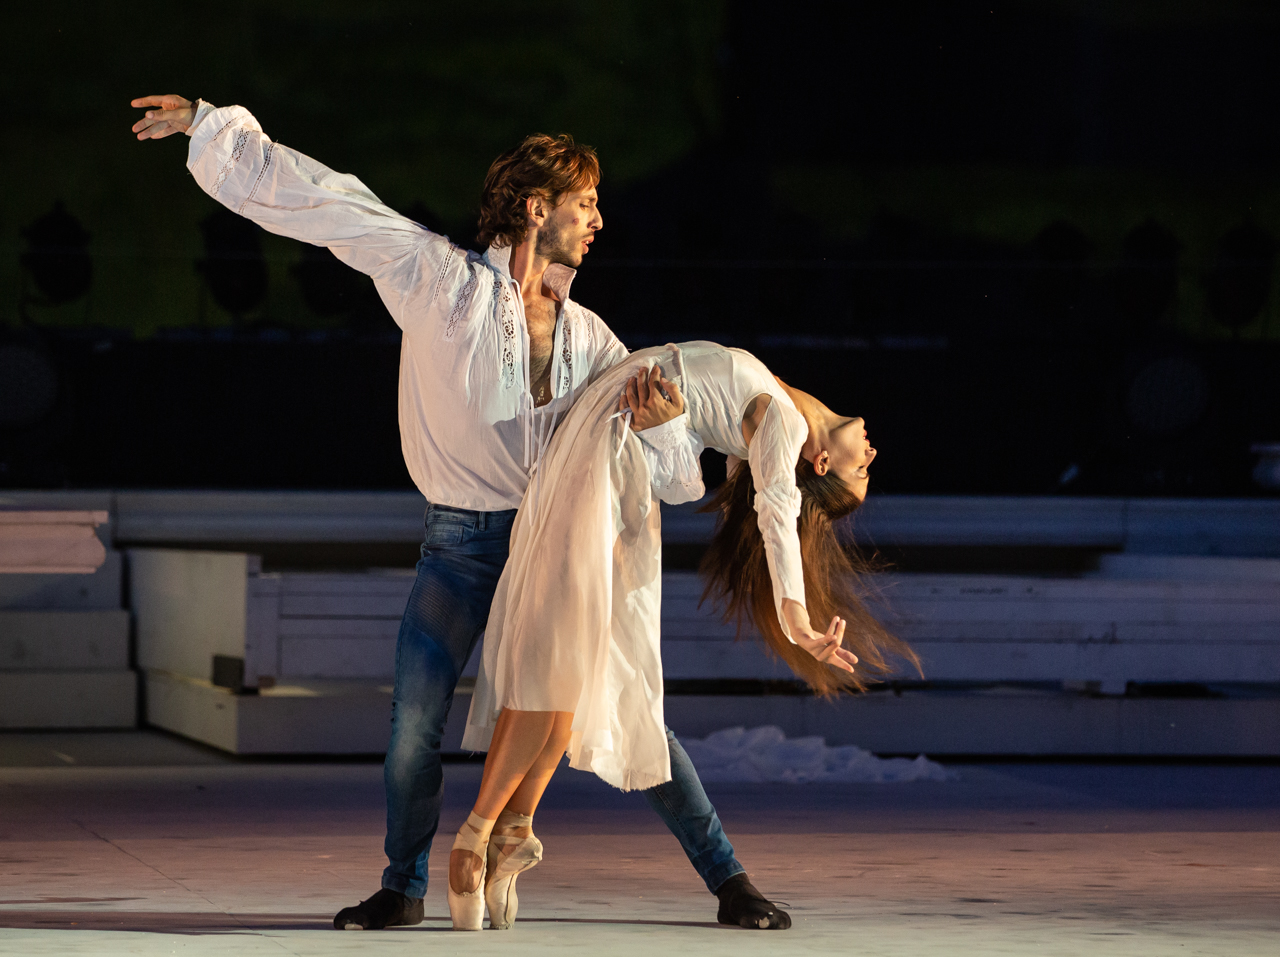 Salvi-Cocino in Romeo e Giulietta di Giuliano Peparini ® Yasuko Kageyama WEB (3)